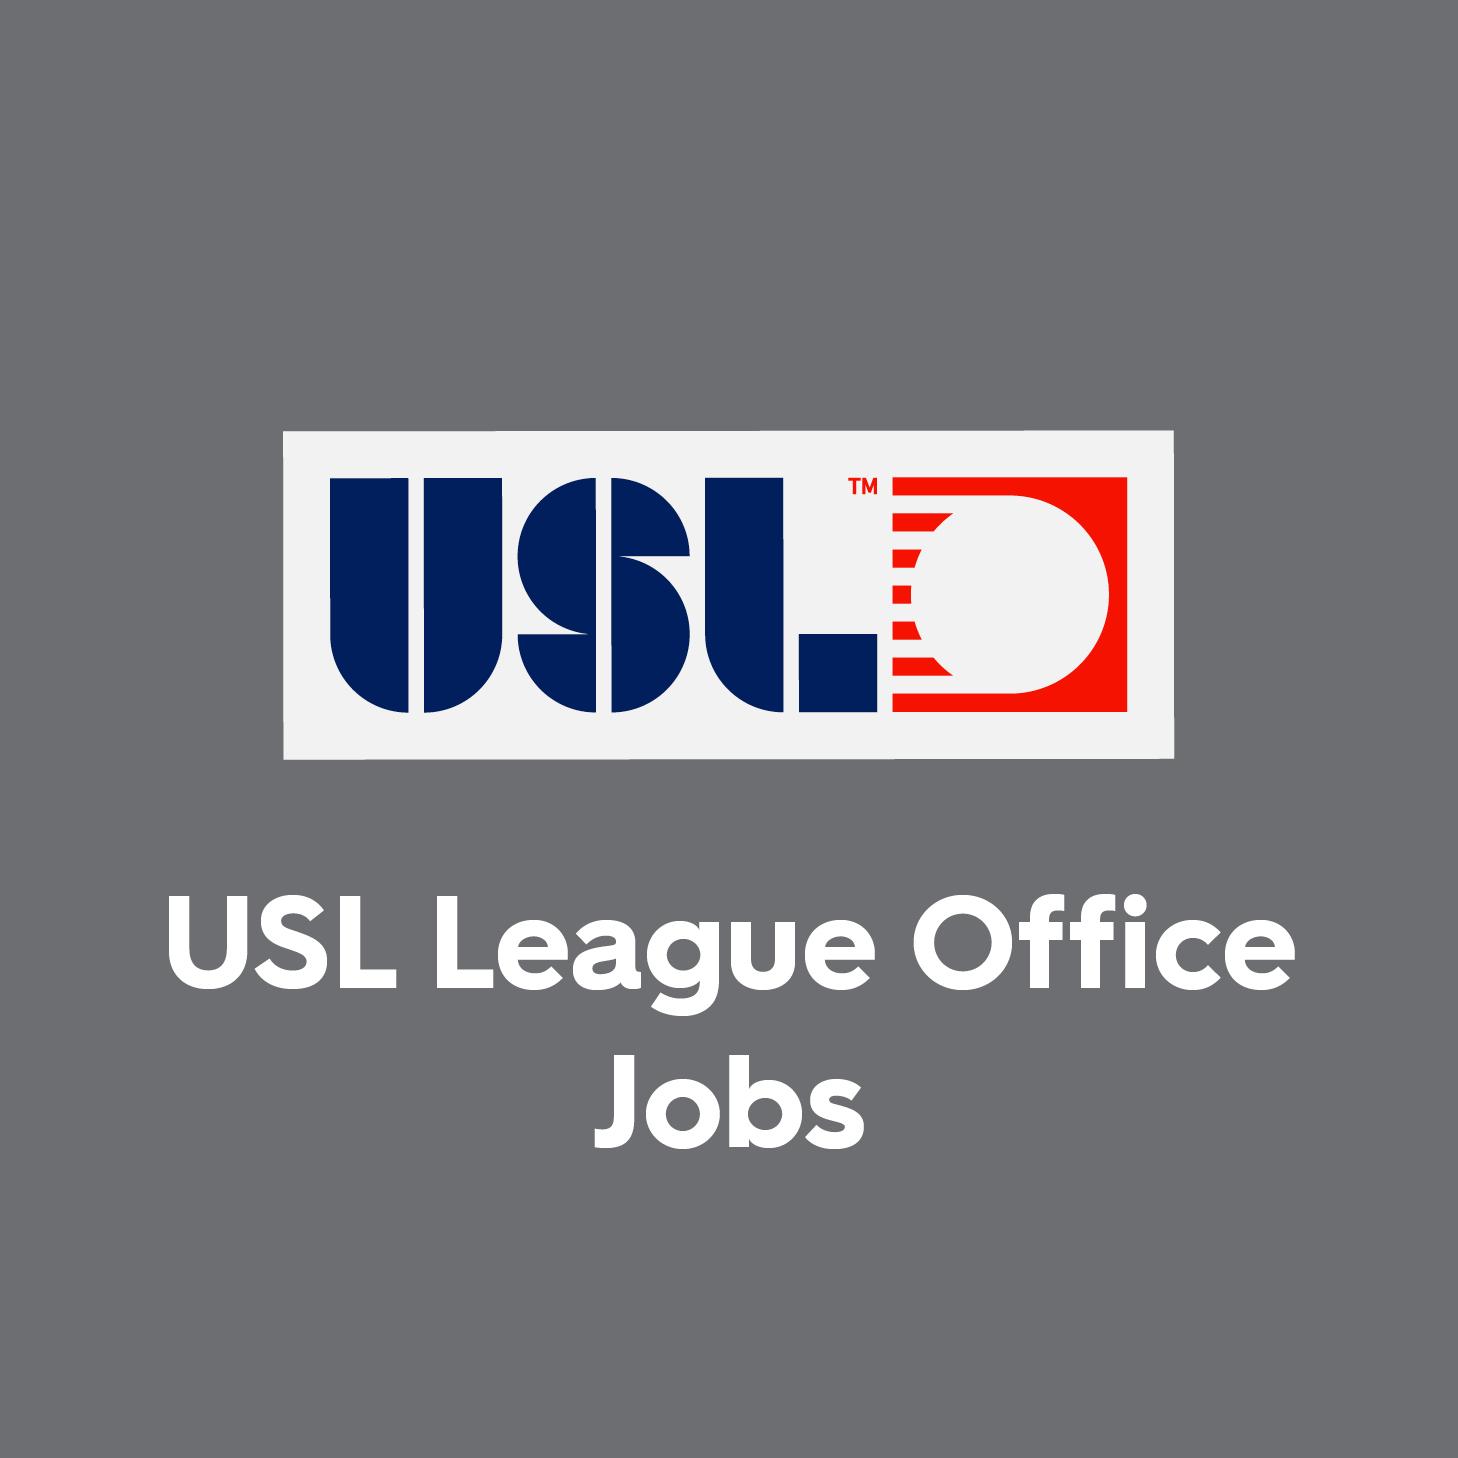 USL League Office